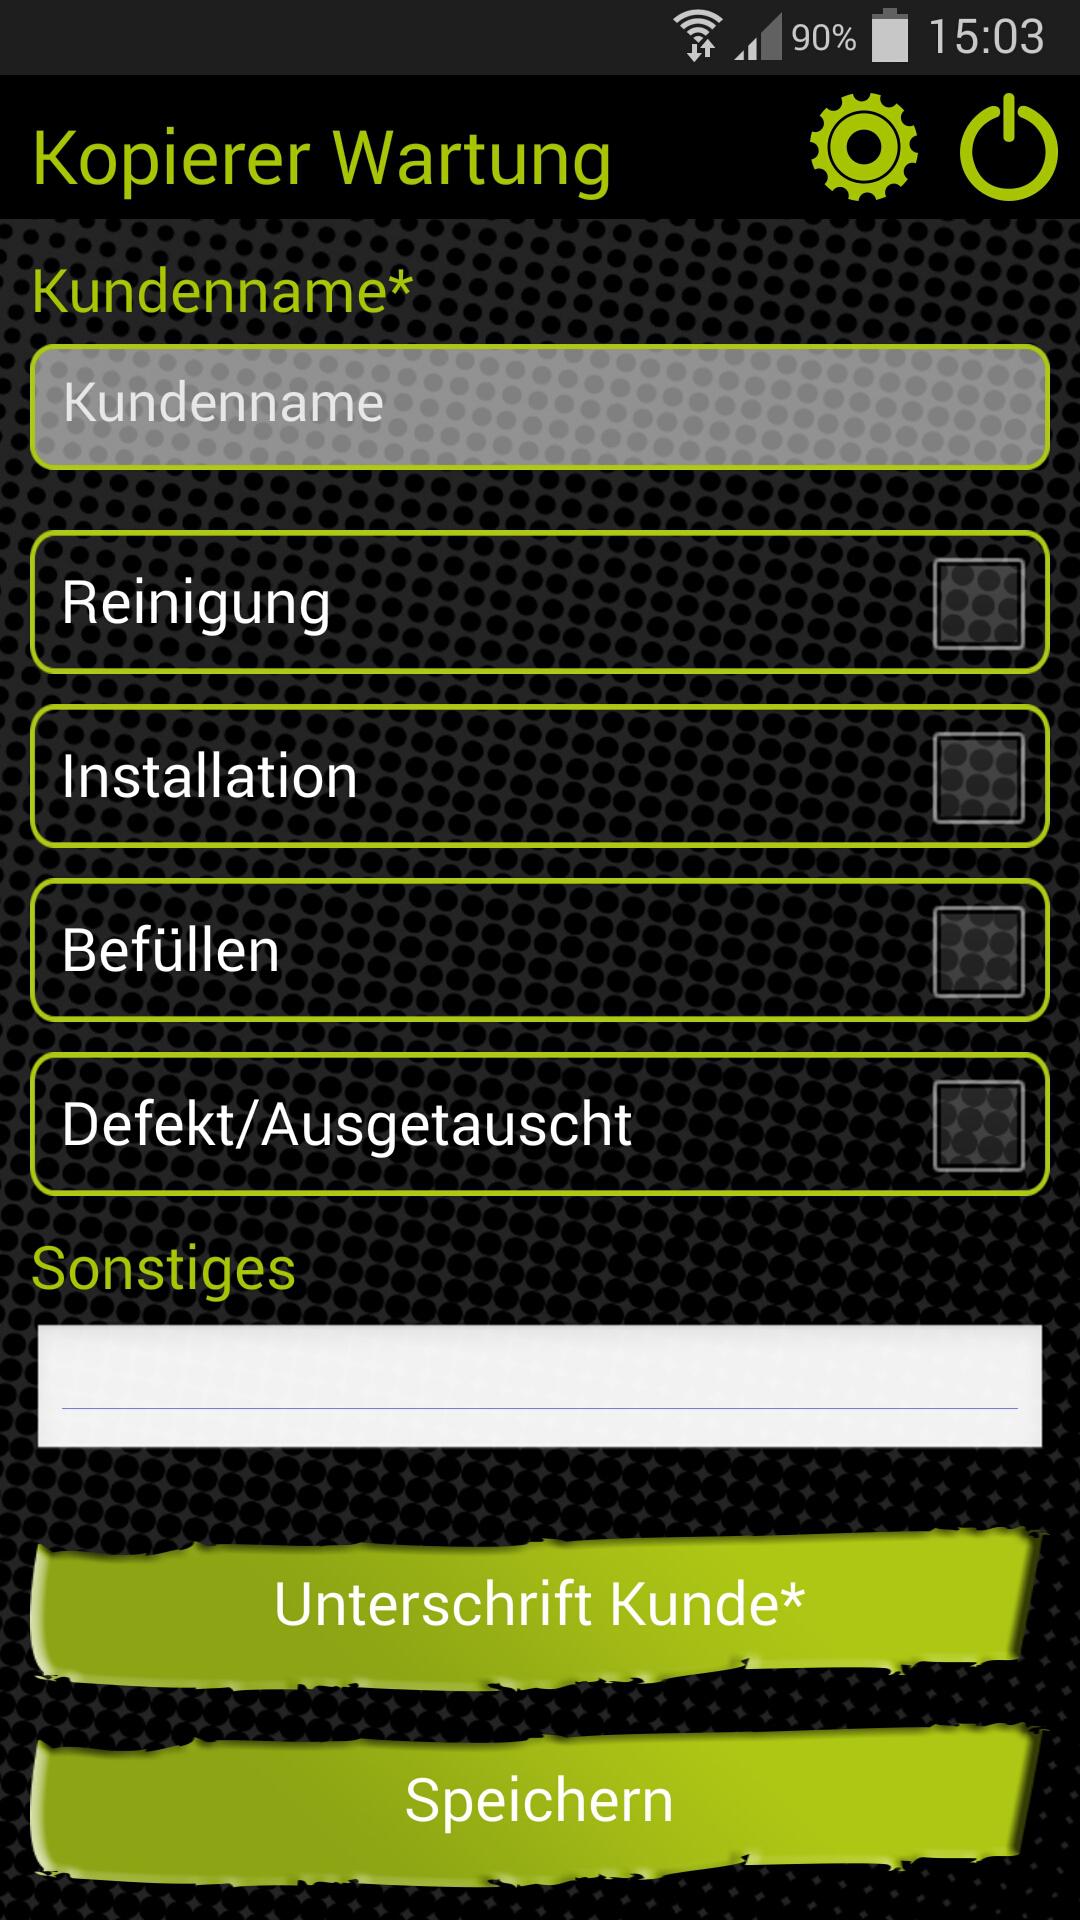 ginstr_app_copierMaintenance_DE_2